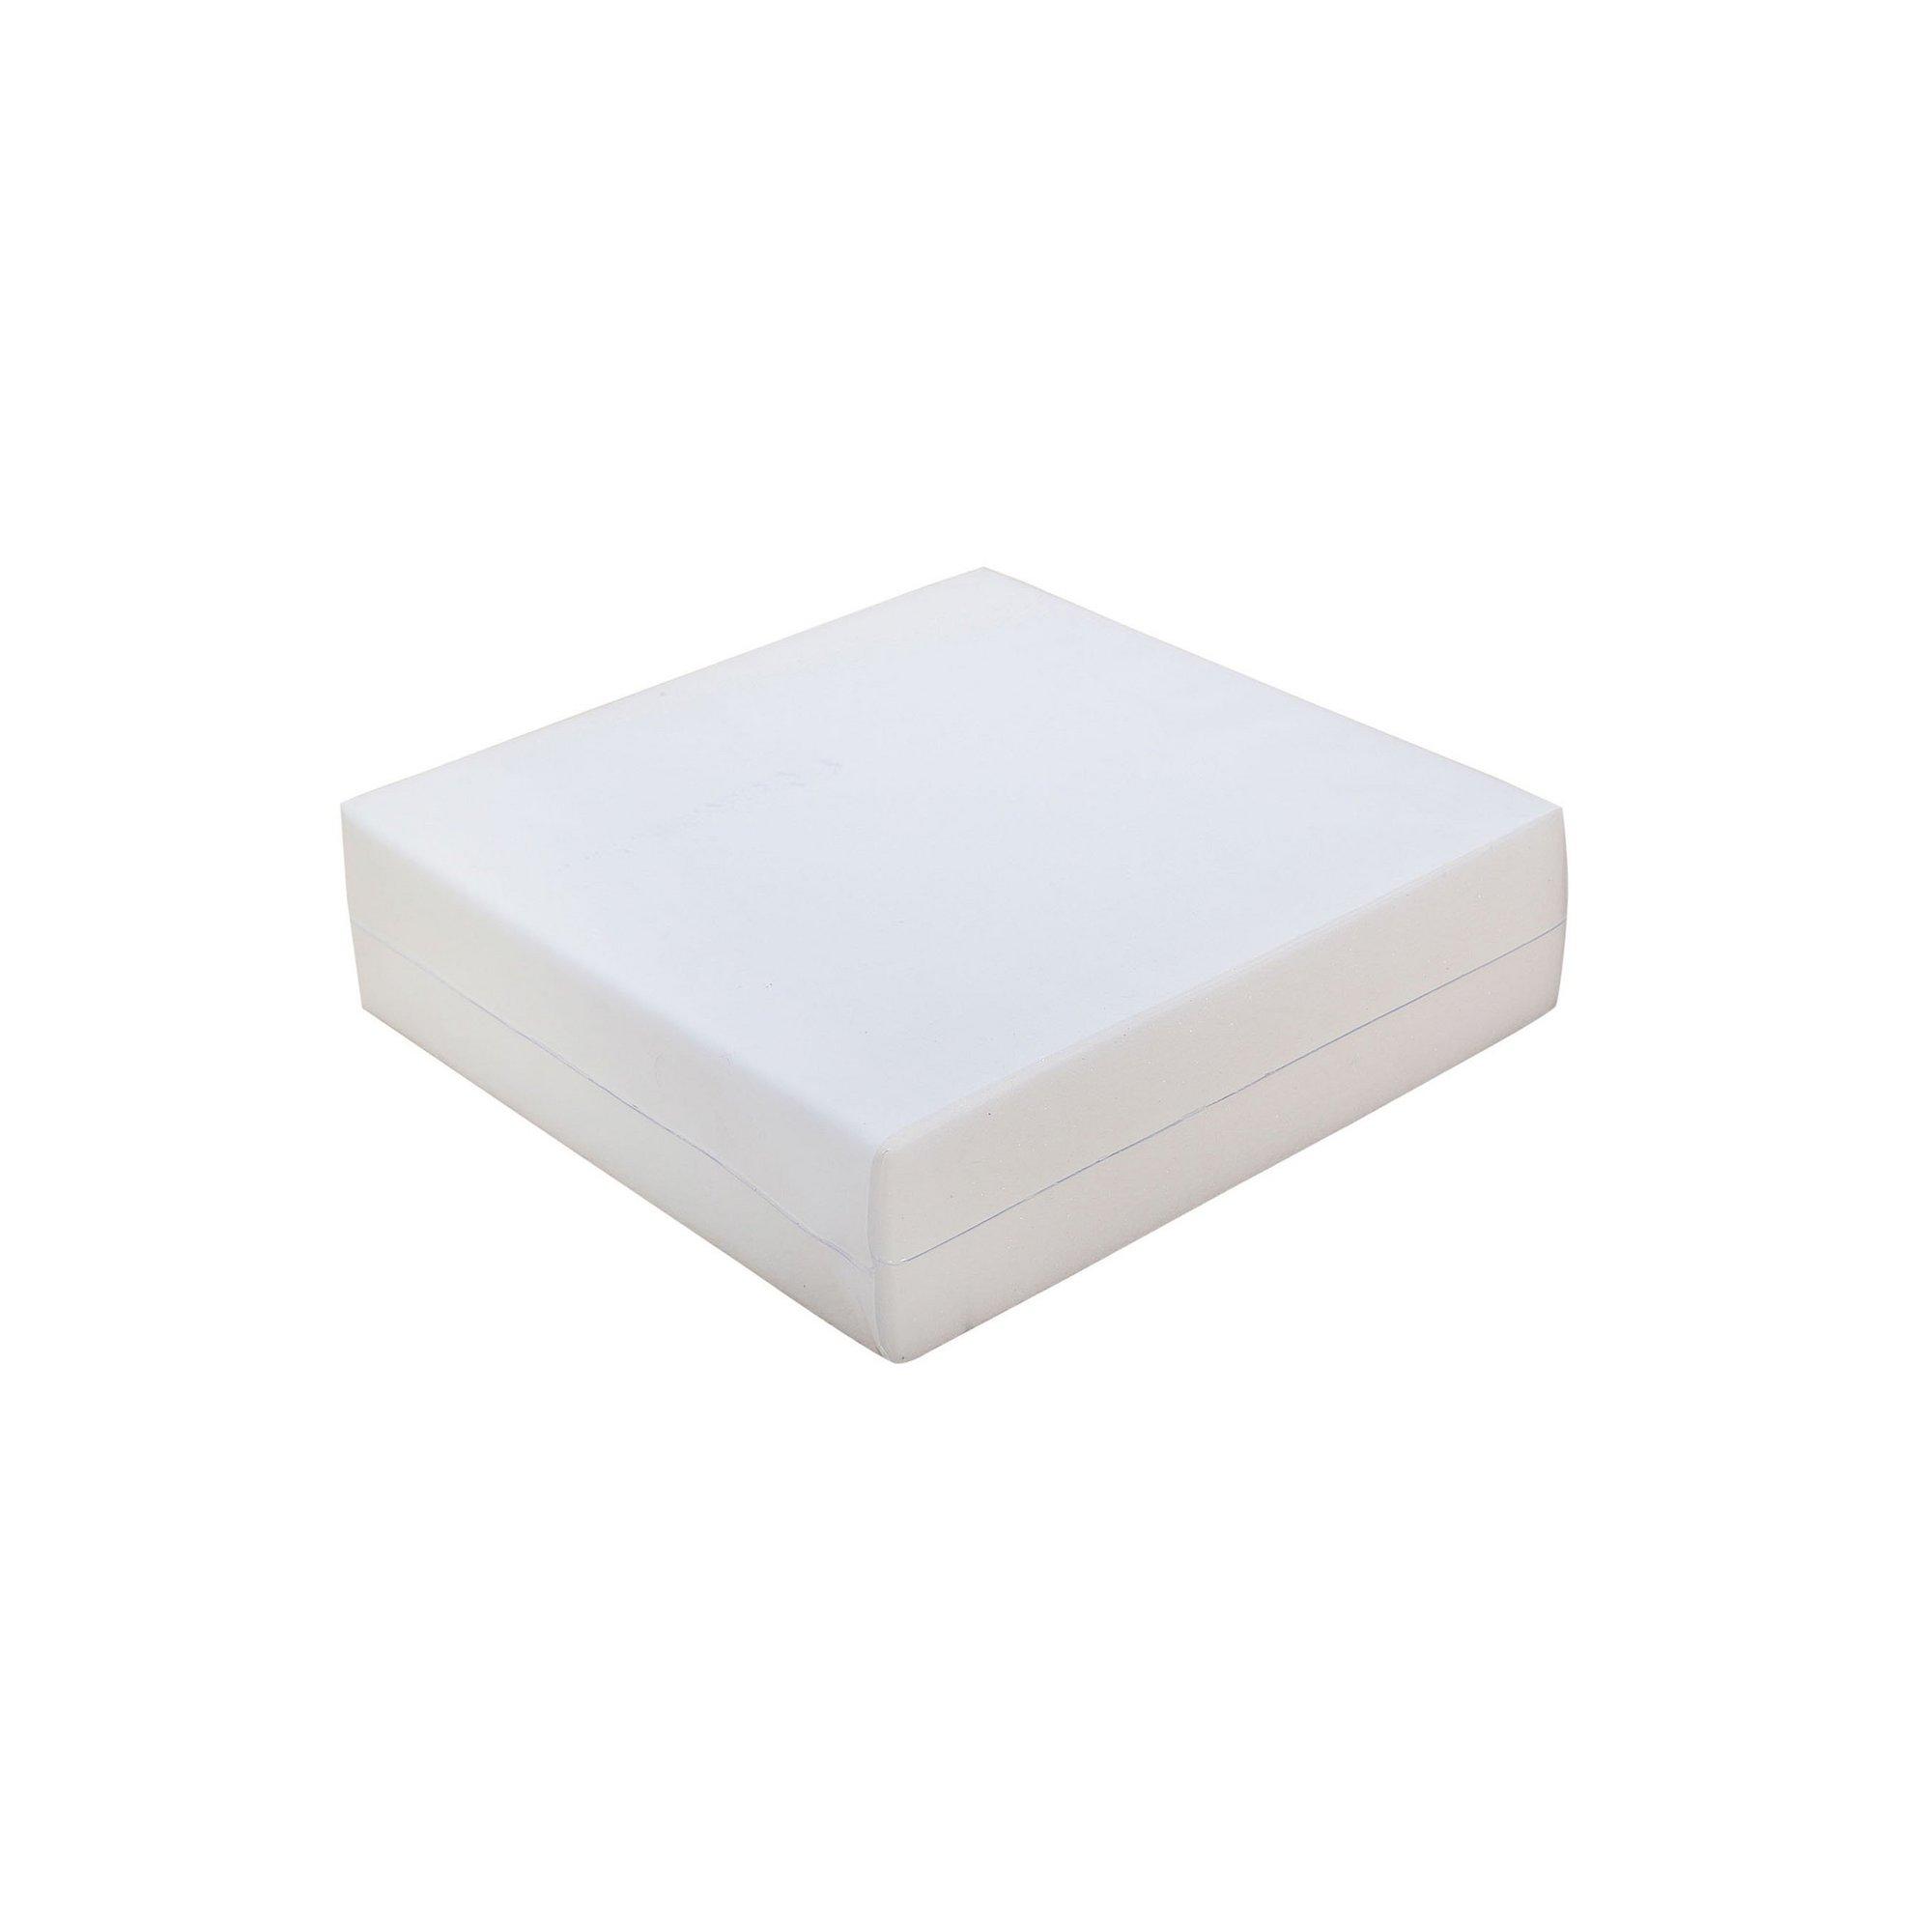 Image of Cot Foam Wipe-Clean Mattress